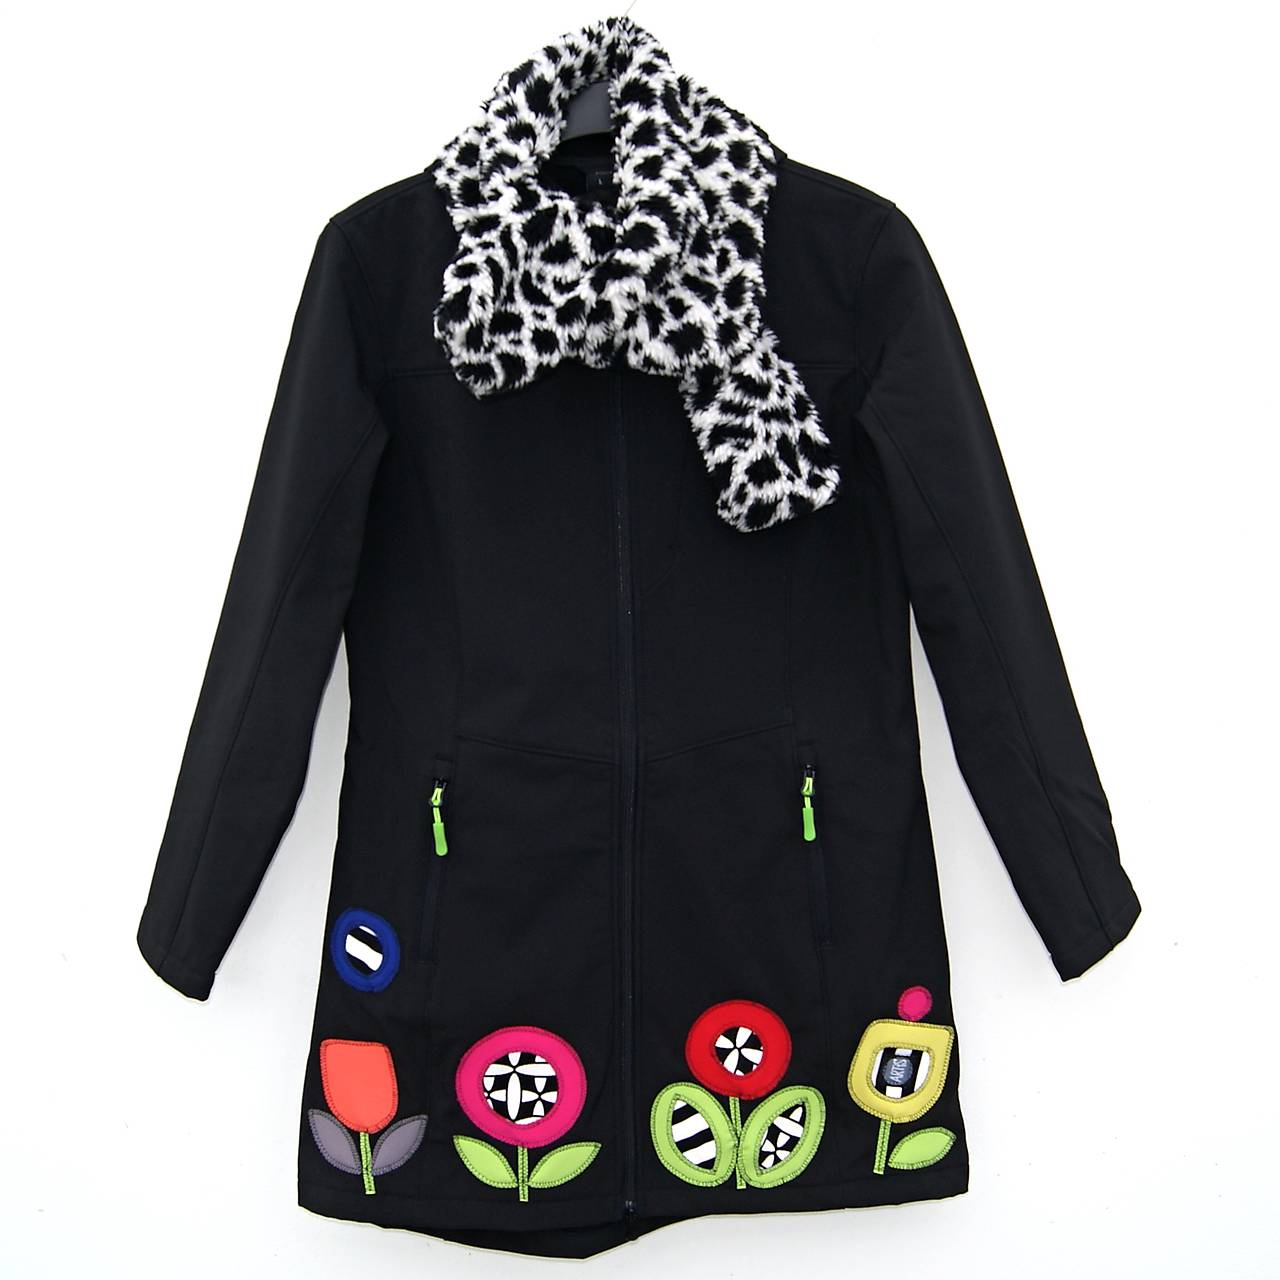 Dámský kabát Floral Mosaic   ARTiS - SAShE.sk - Handmade Kabáty 18279aa43a3